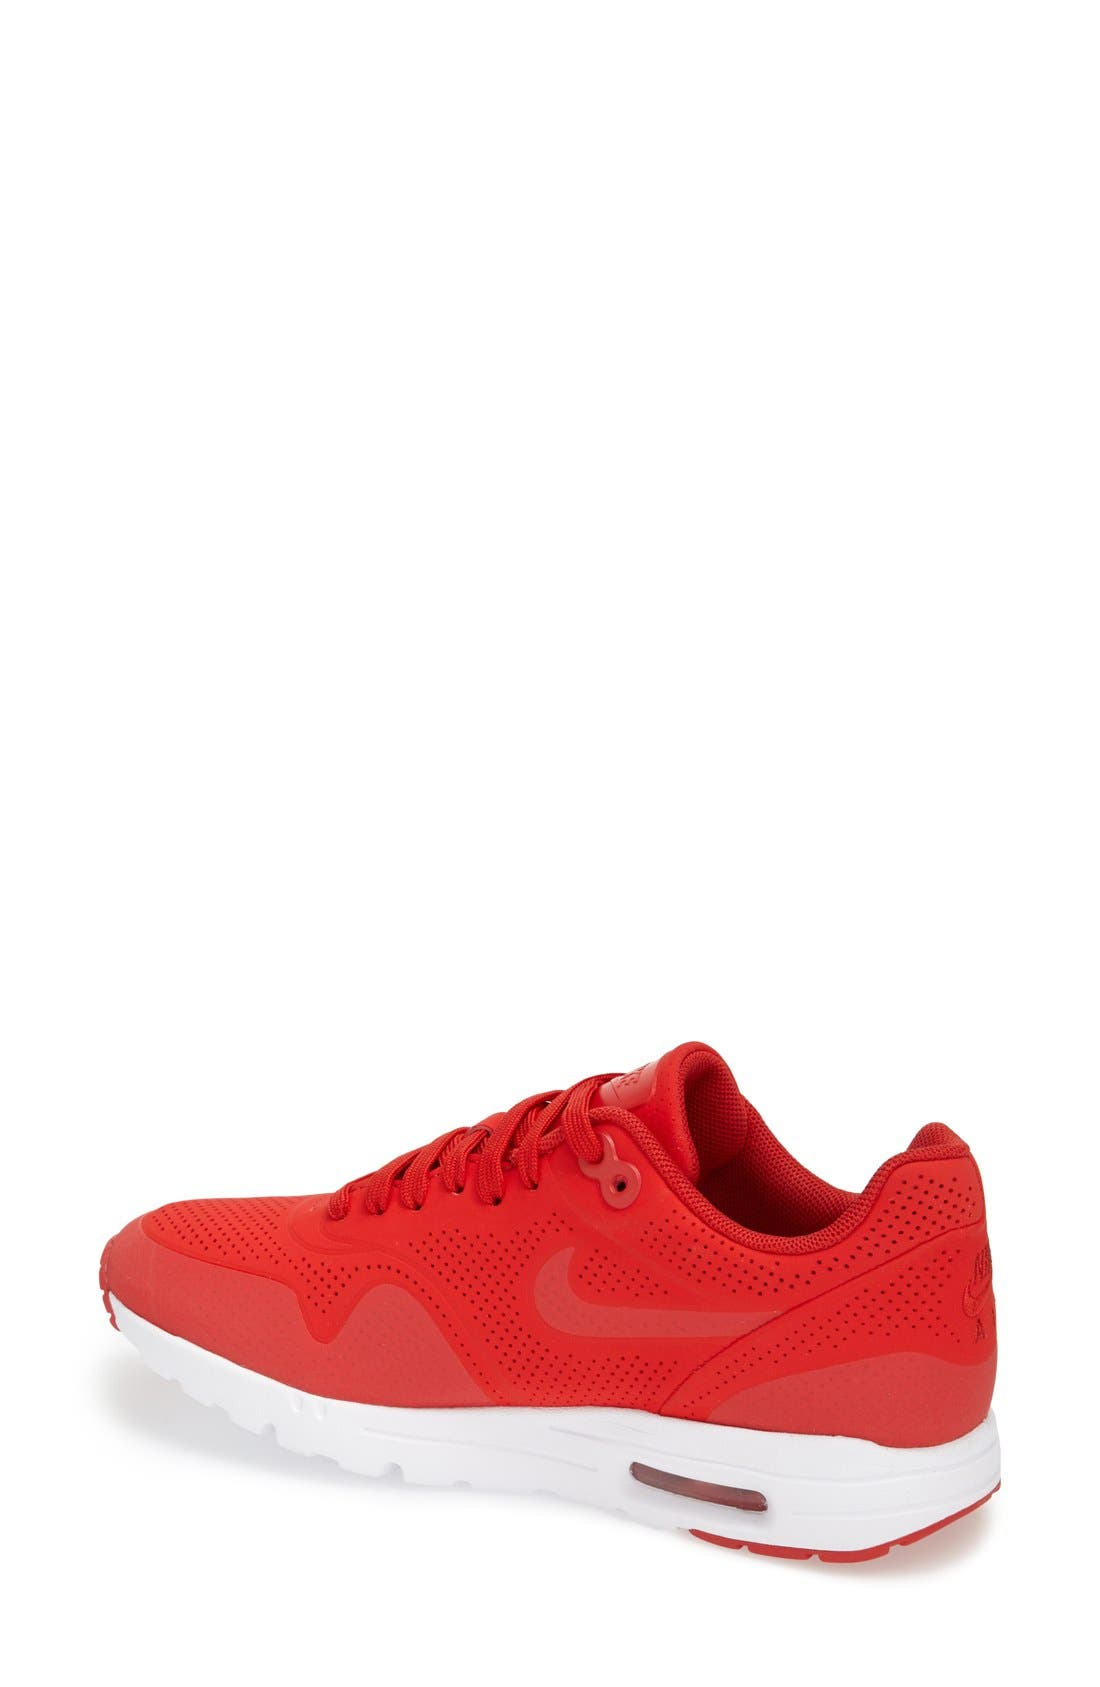 ,                             'Air Max 1 - Ultra Moire' Sneaker,                             Alternate thumbnail 104, color,                             600